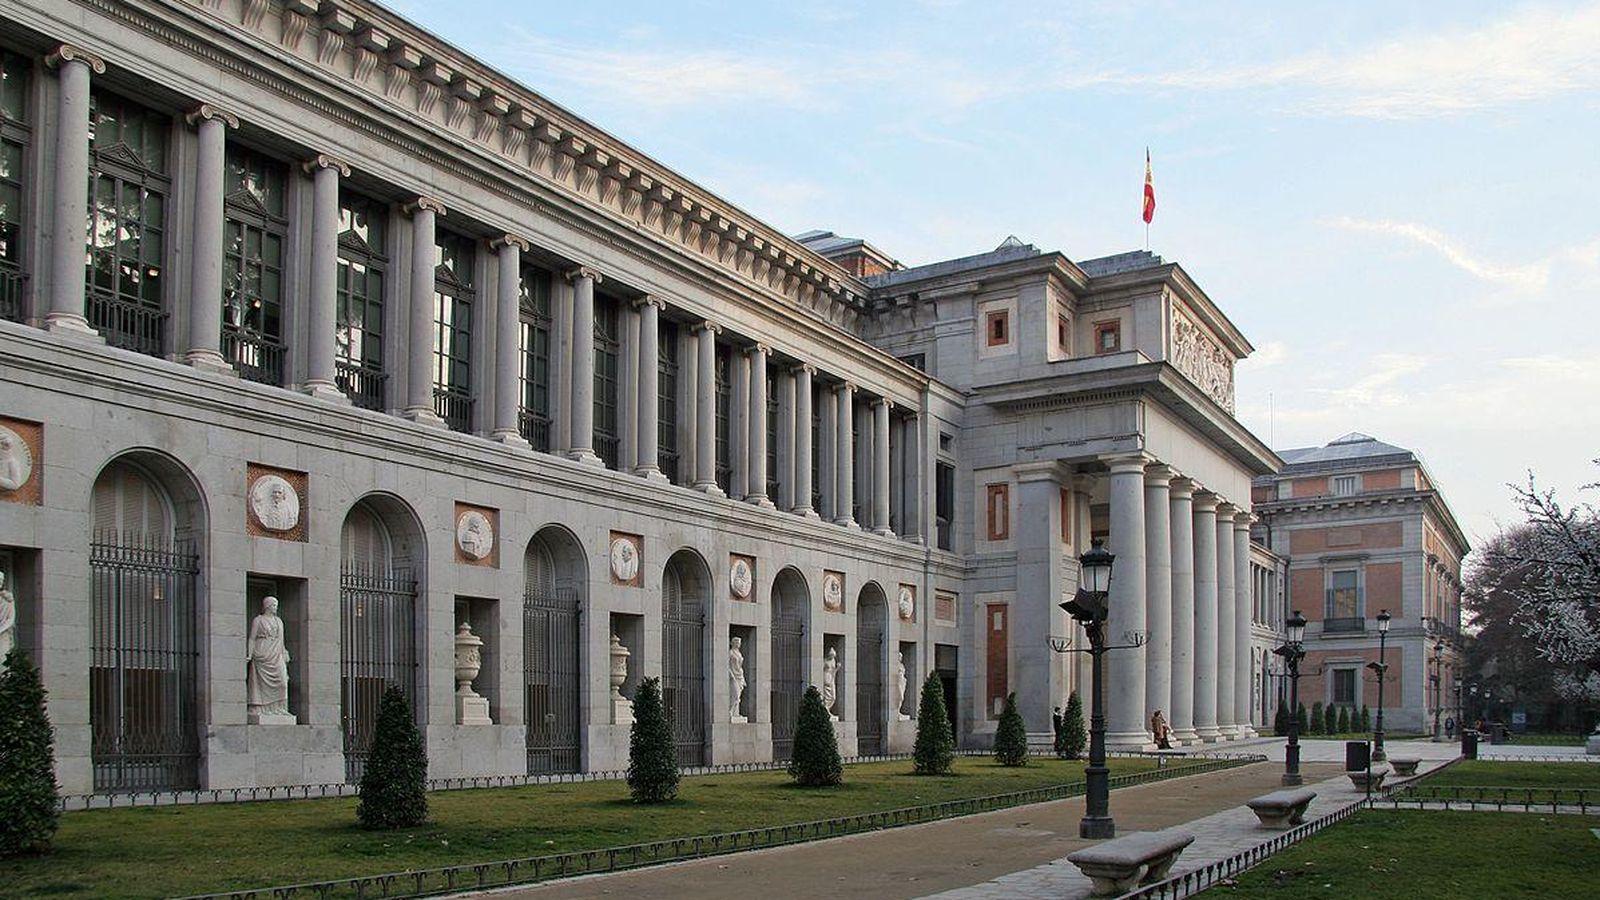 Foto: Fachada del Museo del Prado, Madrid (CC/Brian Snelson)